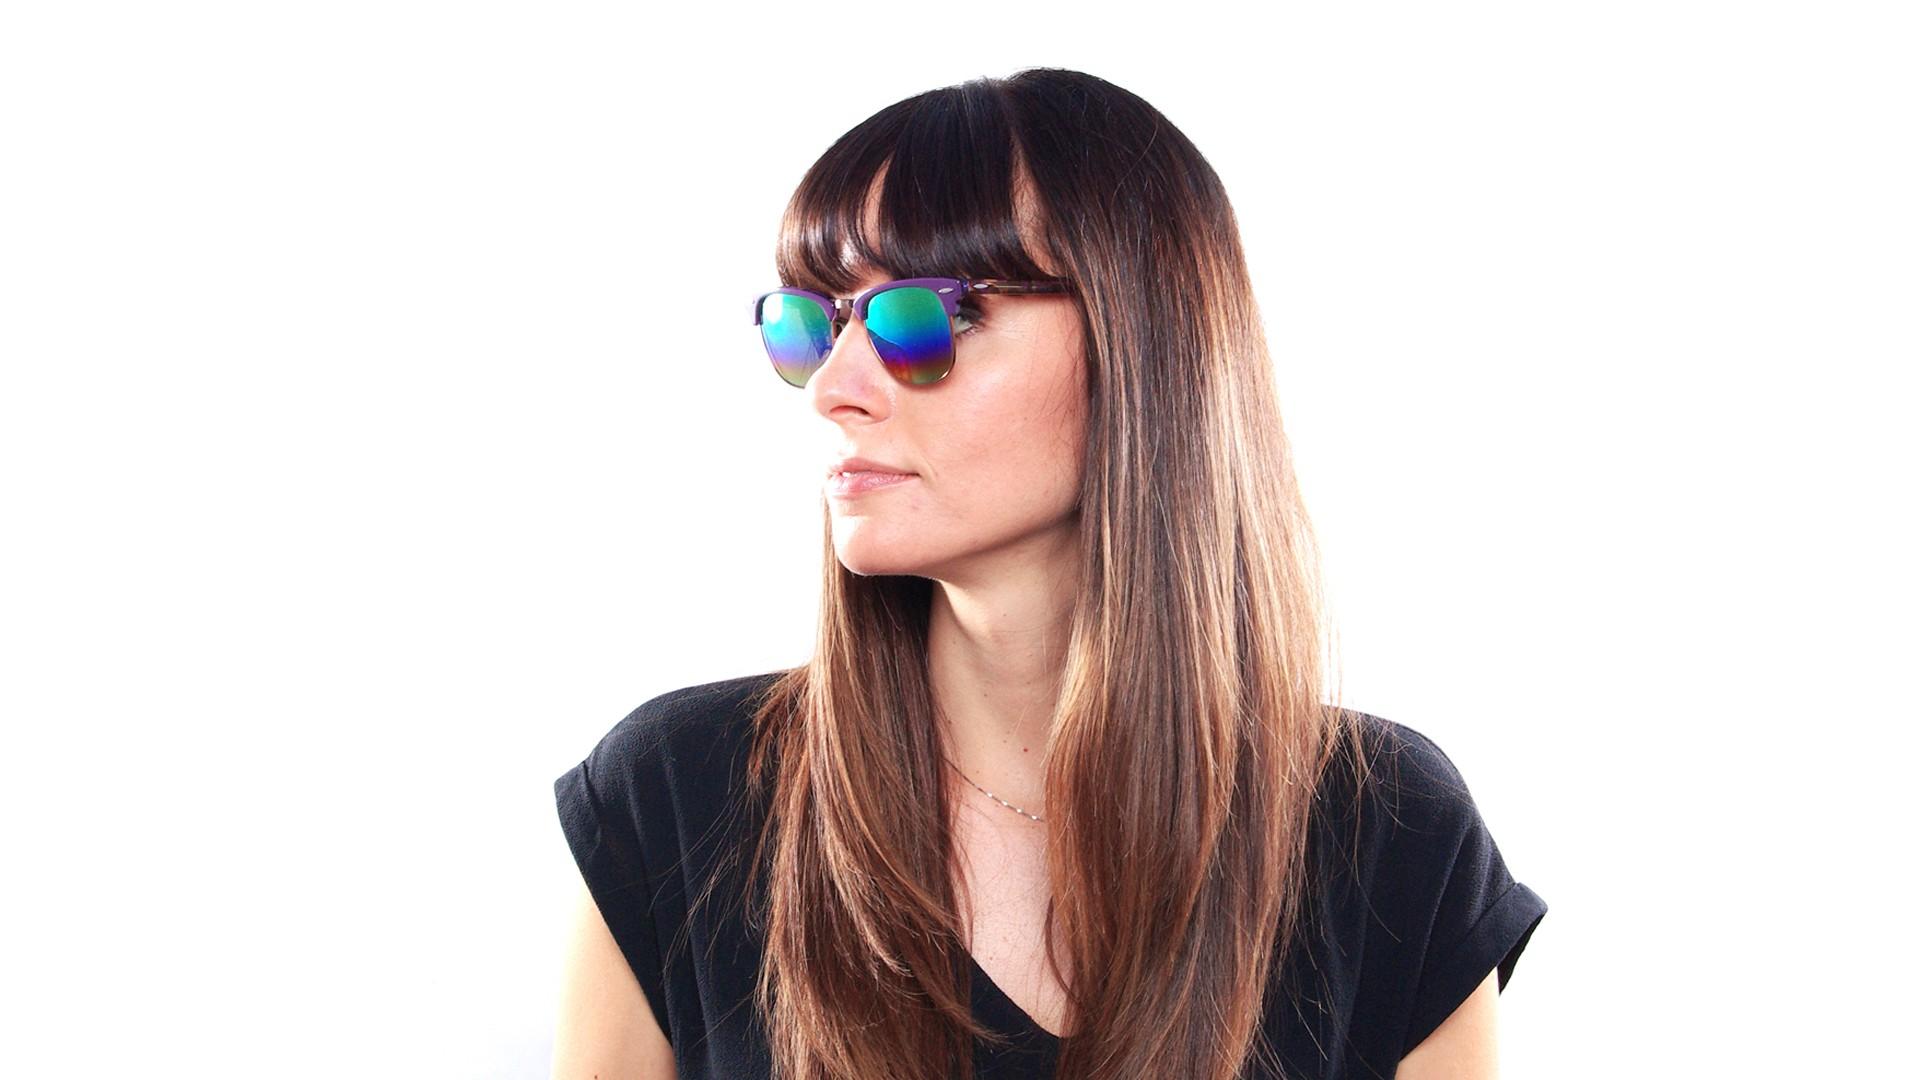 a65e6d03373 ... new zealand sunglasses ray ban clubmaster purple rb3016 1221 c3 49 21  small gradient mirror 2e433